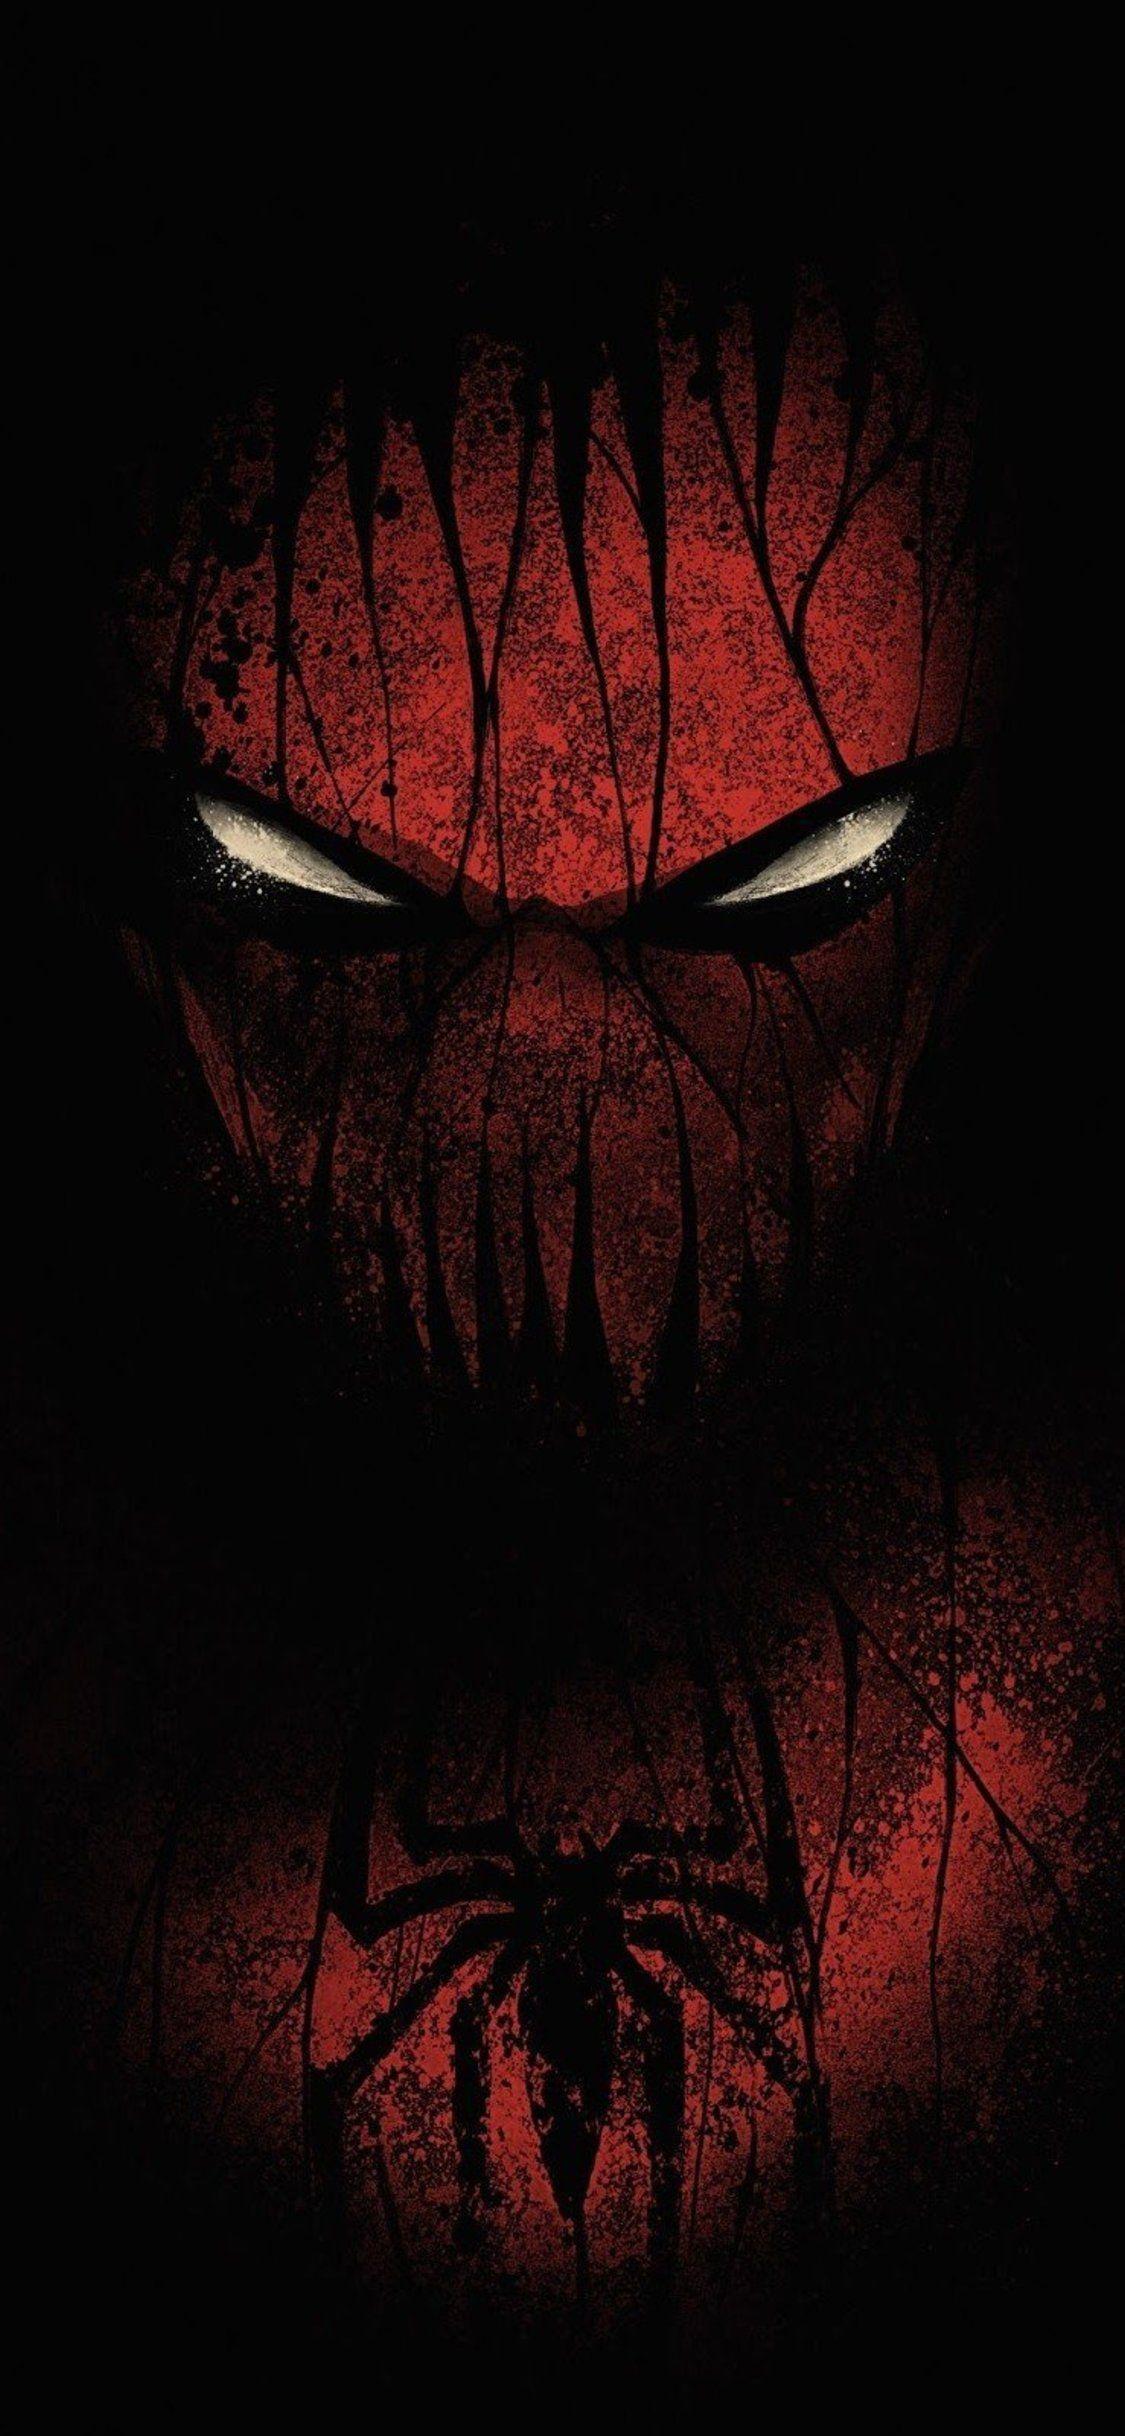 Red Black Spiderman Iphone Xs Iphone 10 Iphone X Hd 1125x2436 Wallpaper Teahub Io